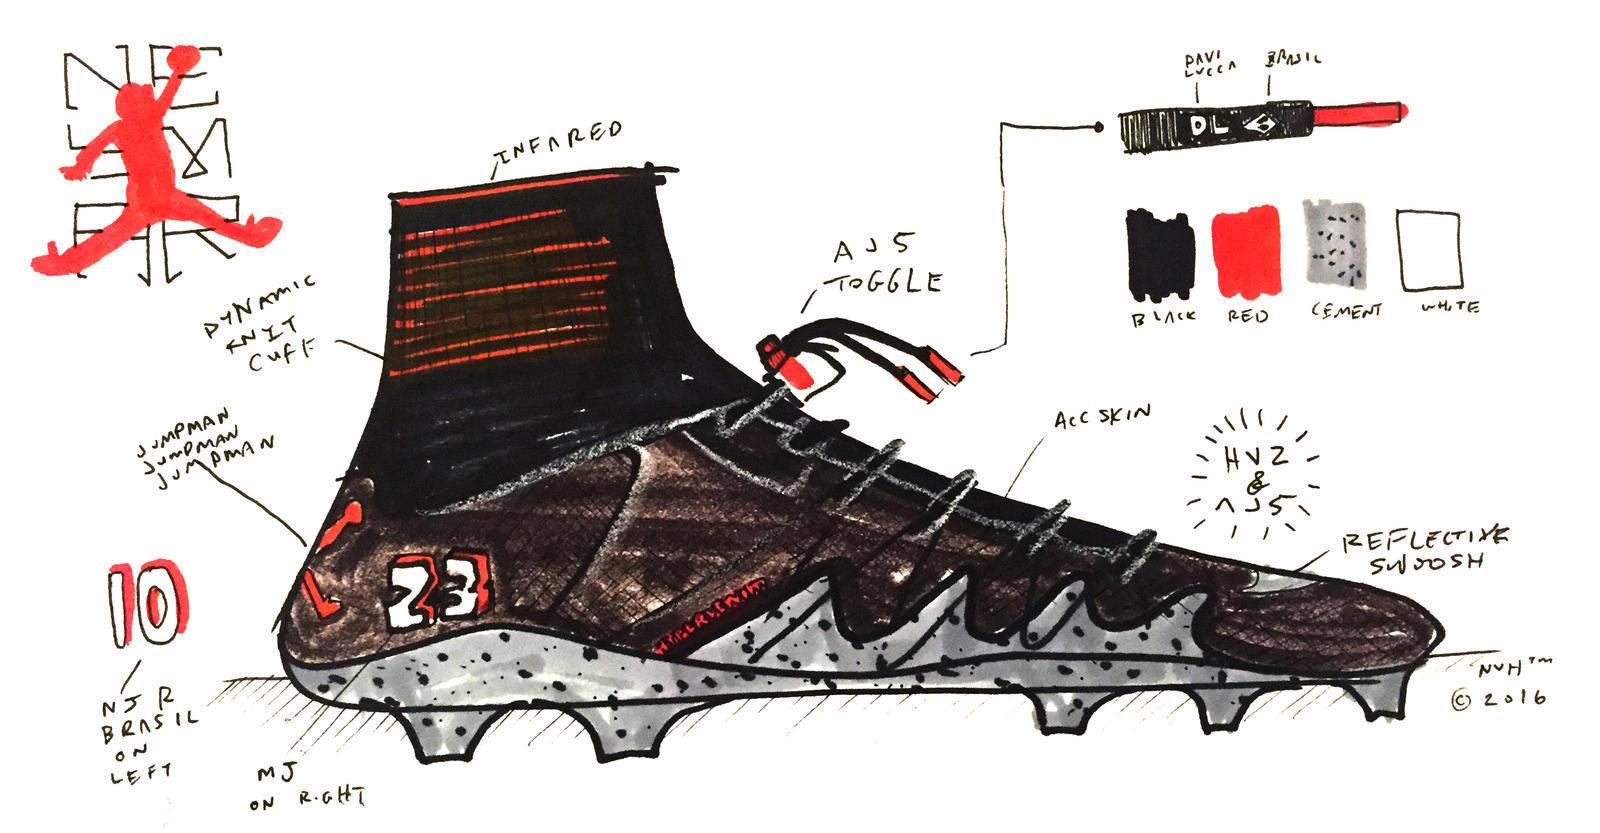 Nike Designer Nathan Vanhook Erklärt Den Njr X Jordan Hypervenom 2